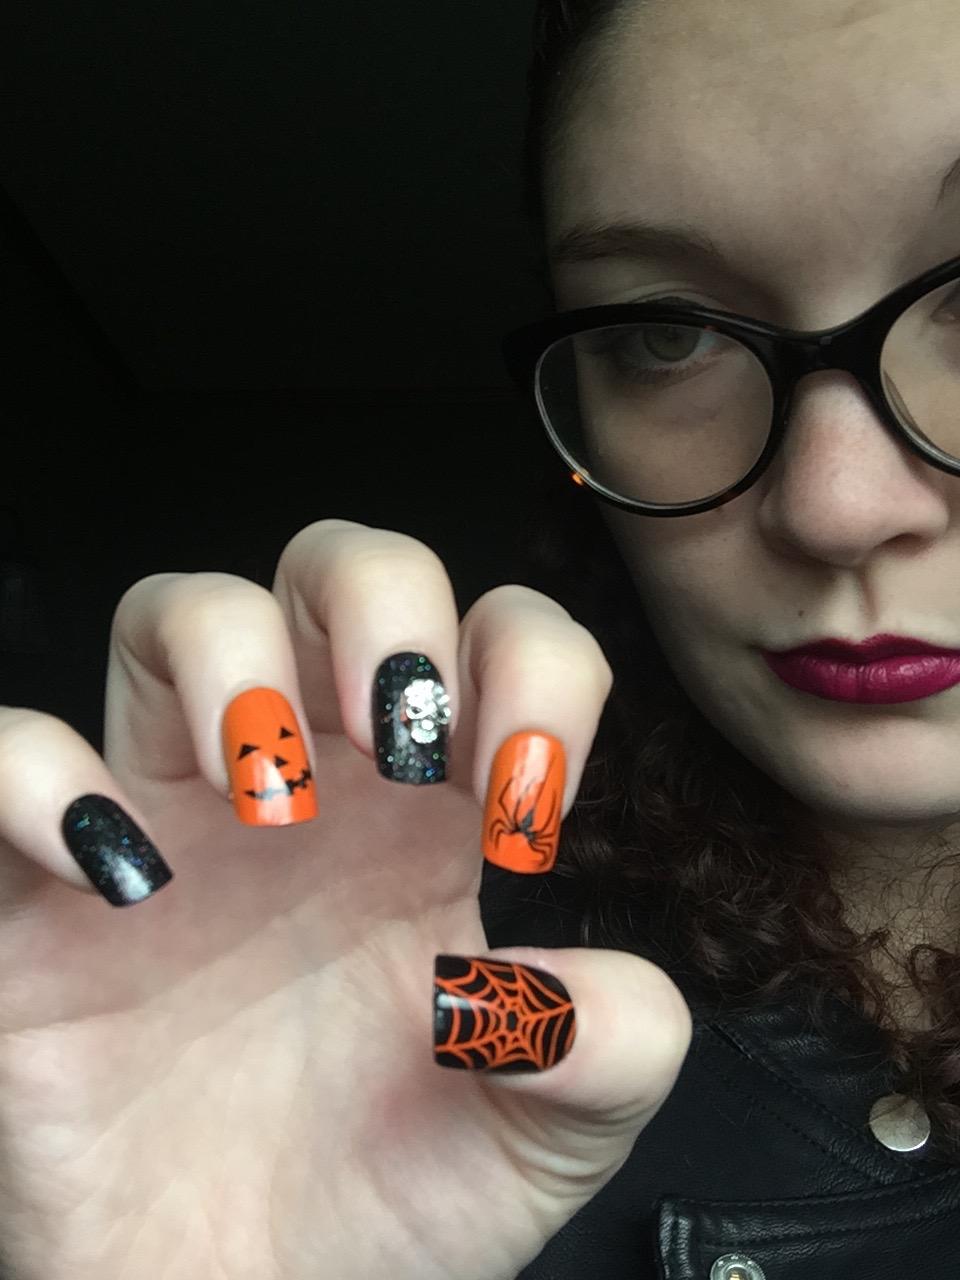 how to make impress nails last longer